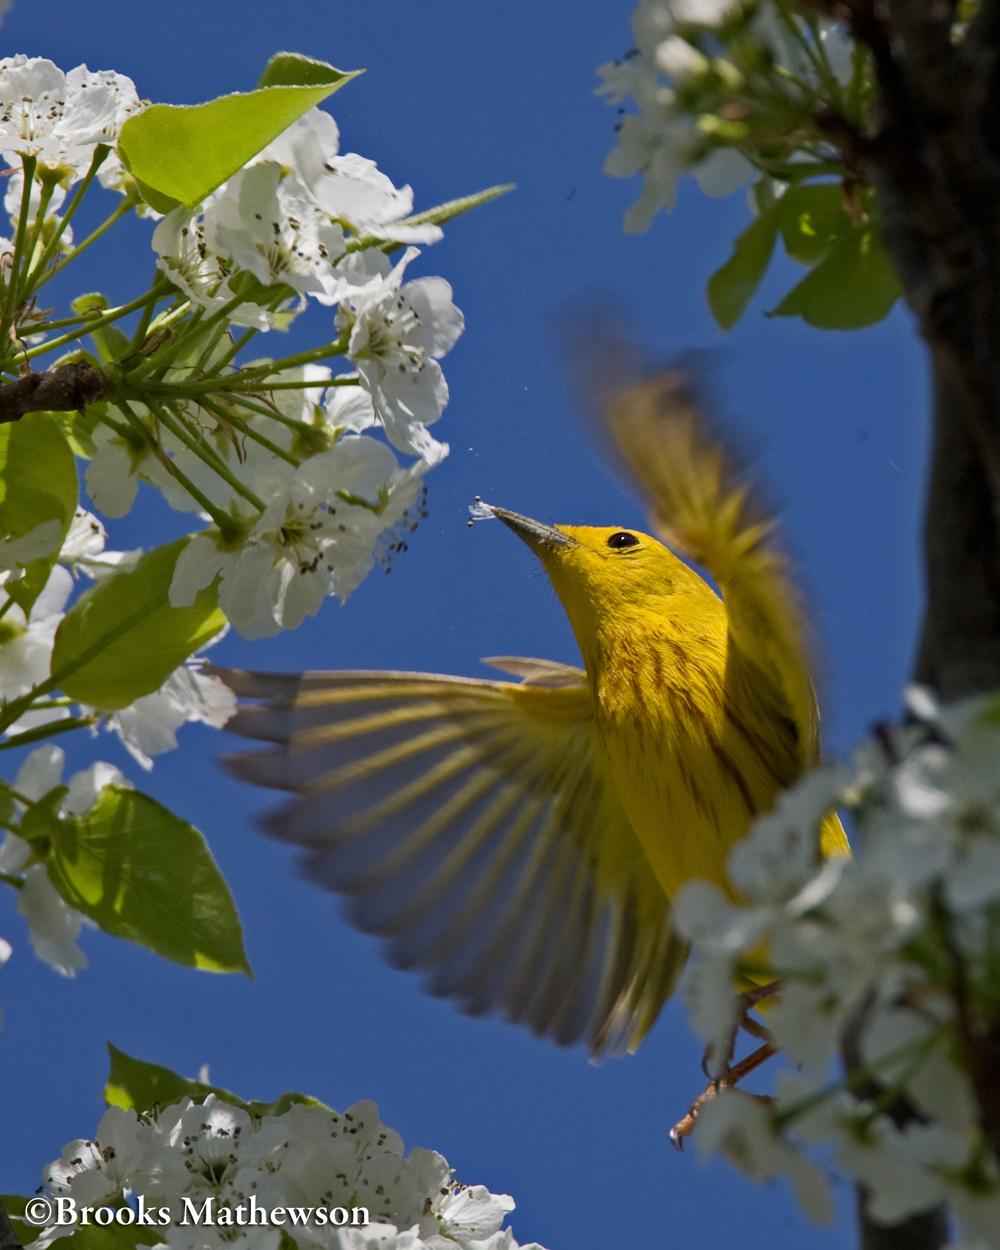 YellowWarblerInFlight-c.jpg